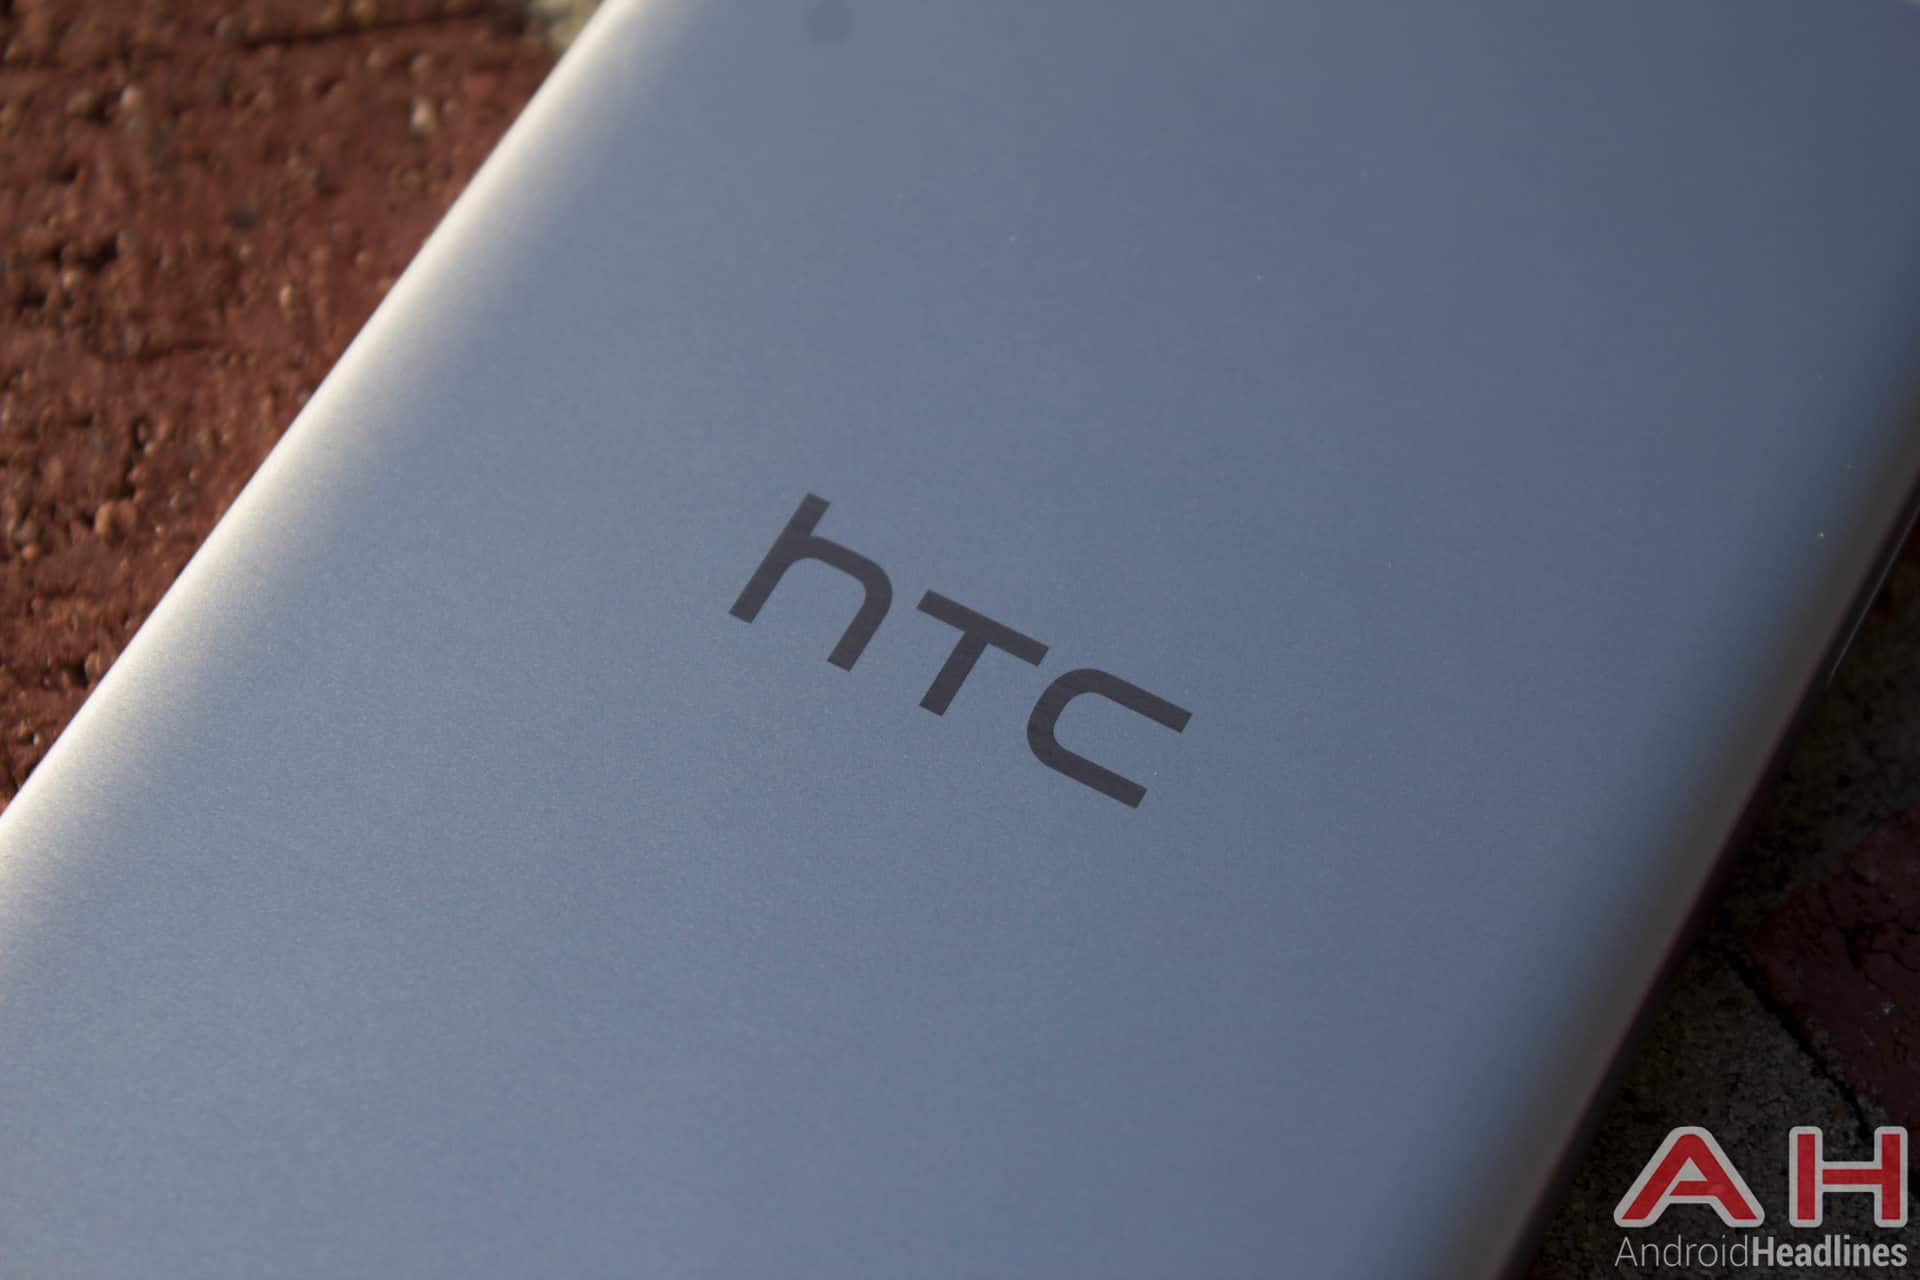 HTC-One-A9-AH-logo-1